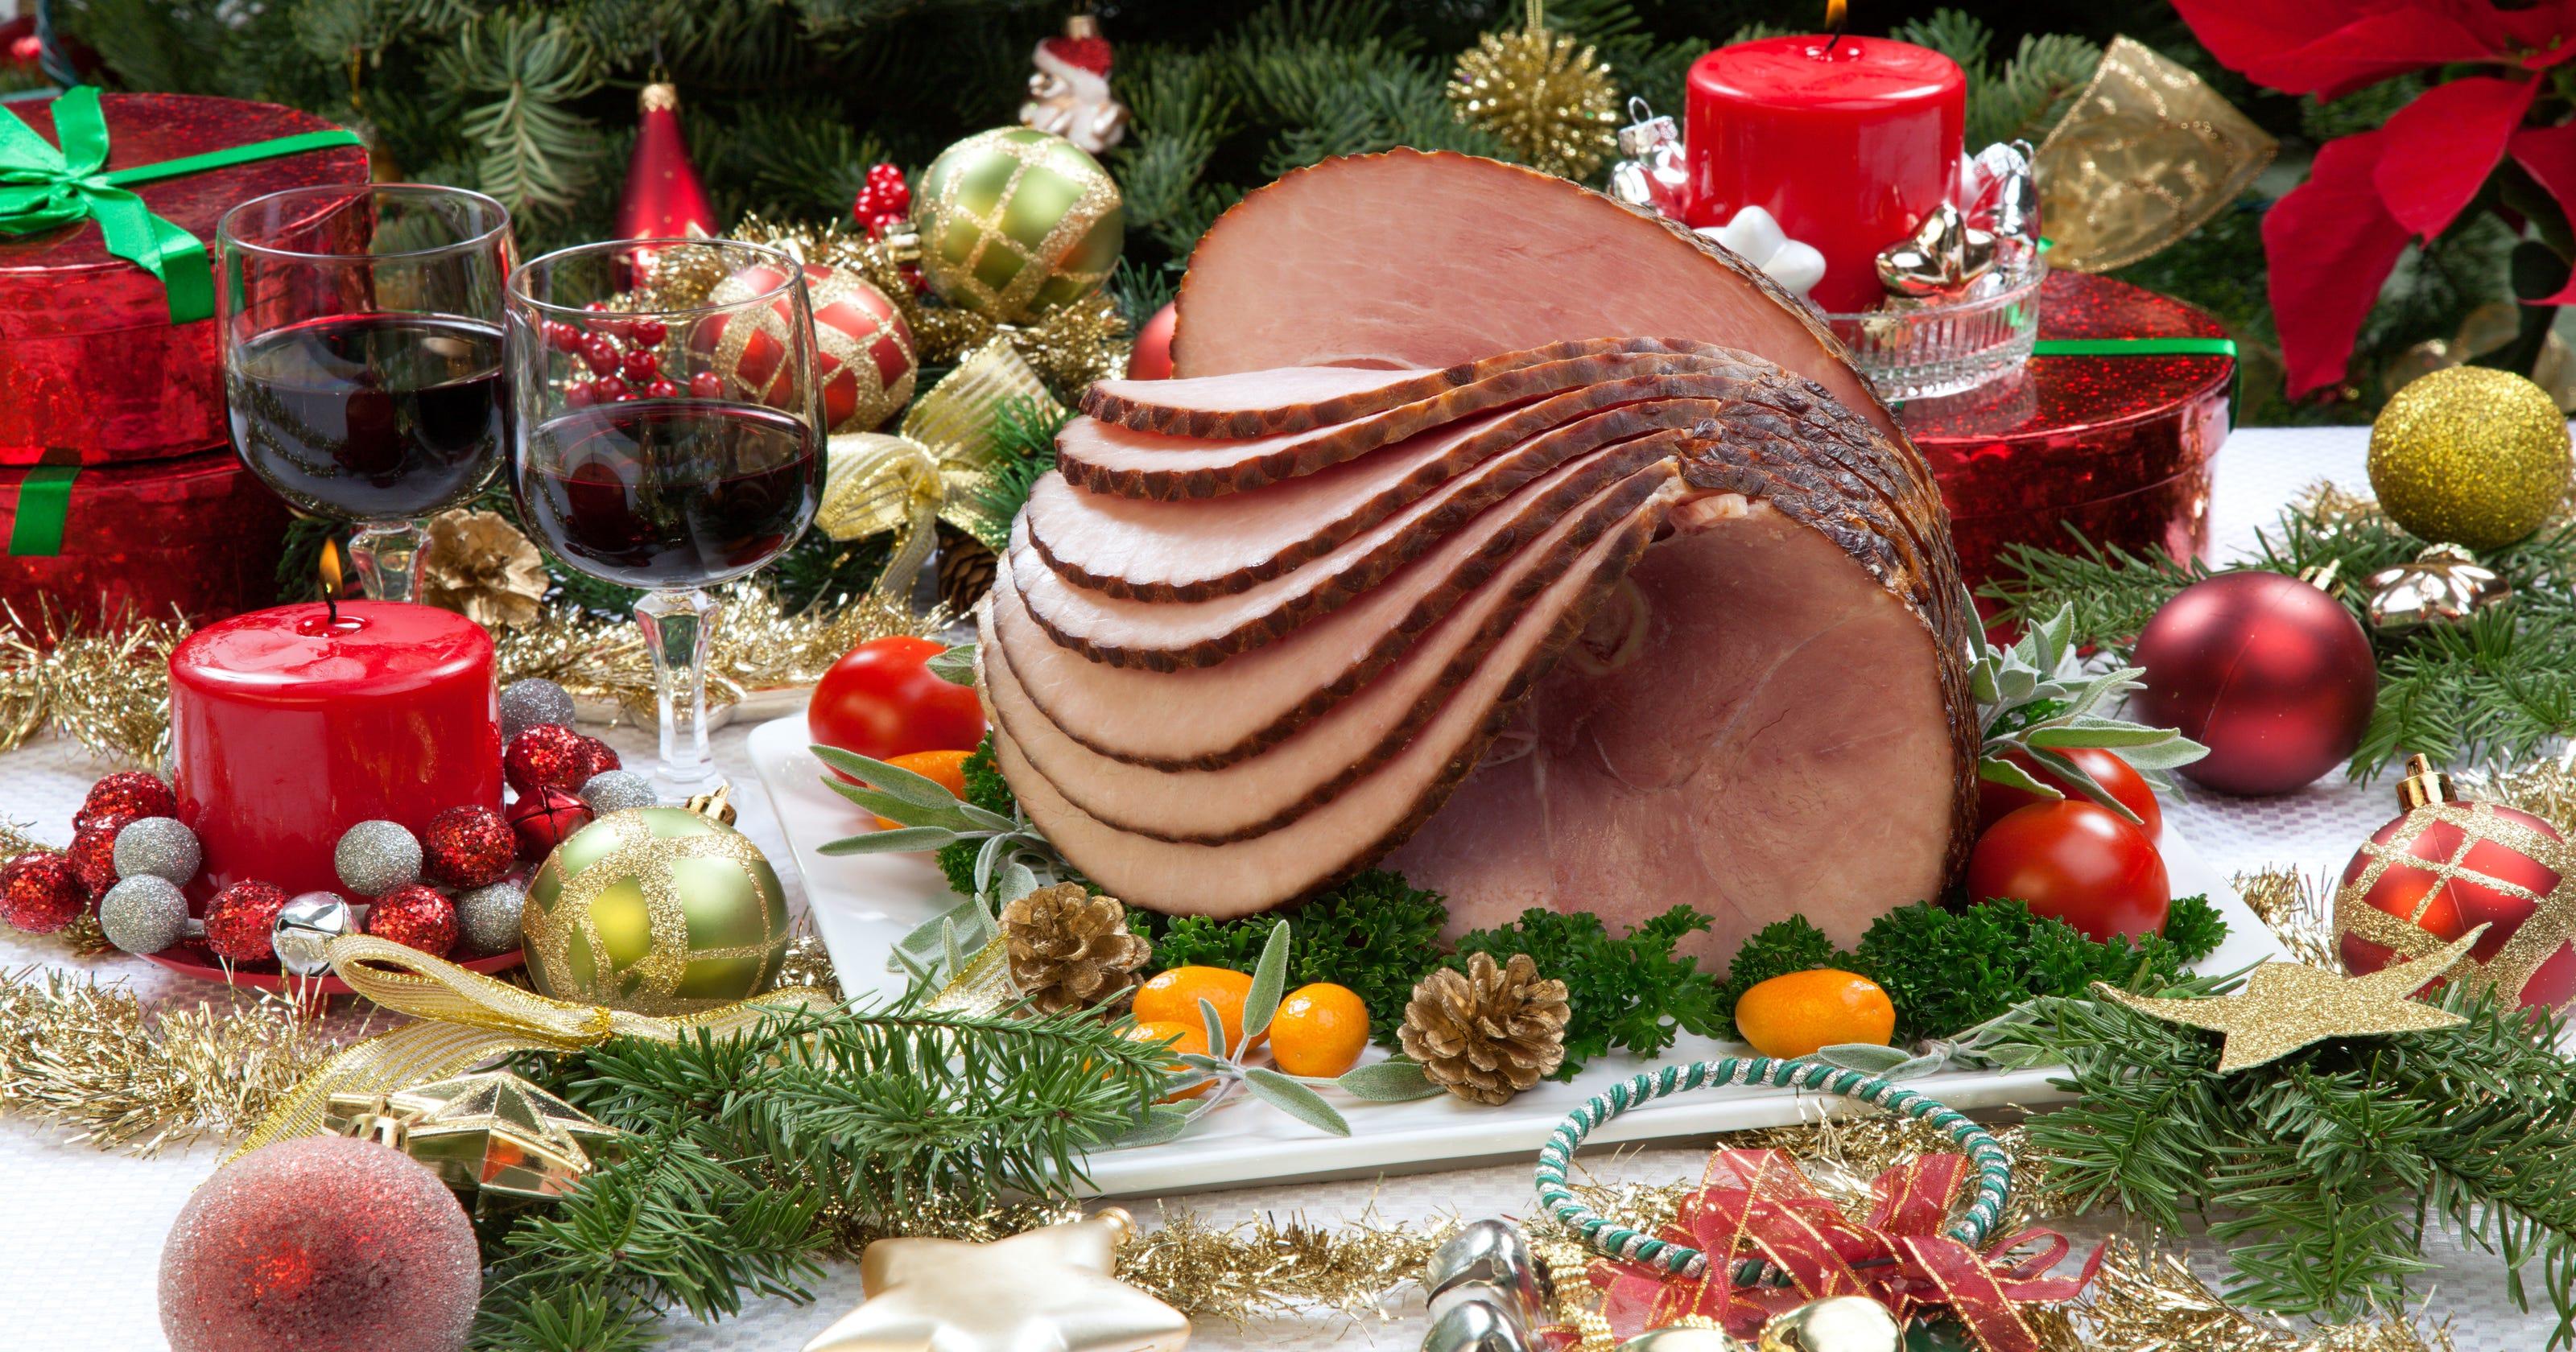 Christmas Meal.Where To Get Your Christmas Meal To Go 2017